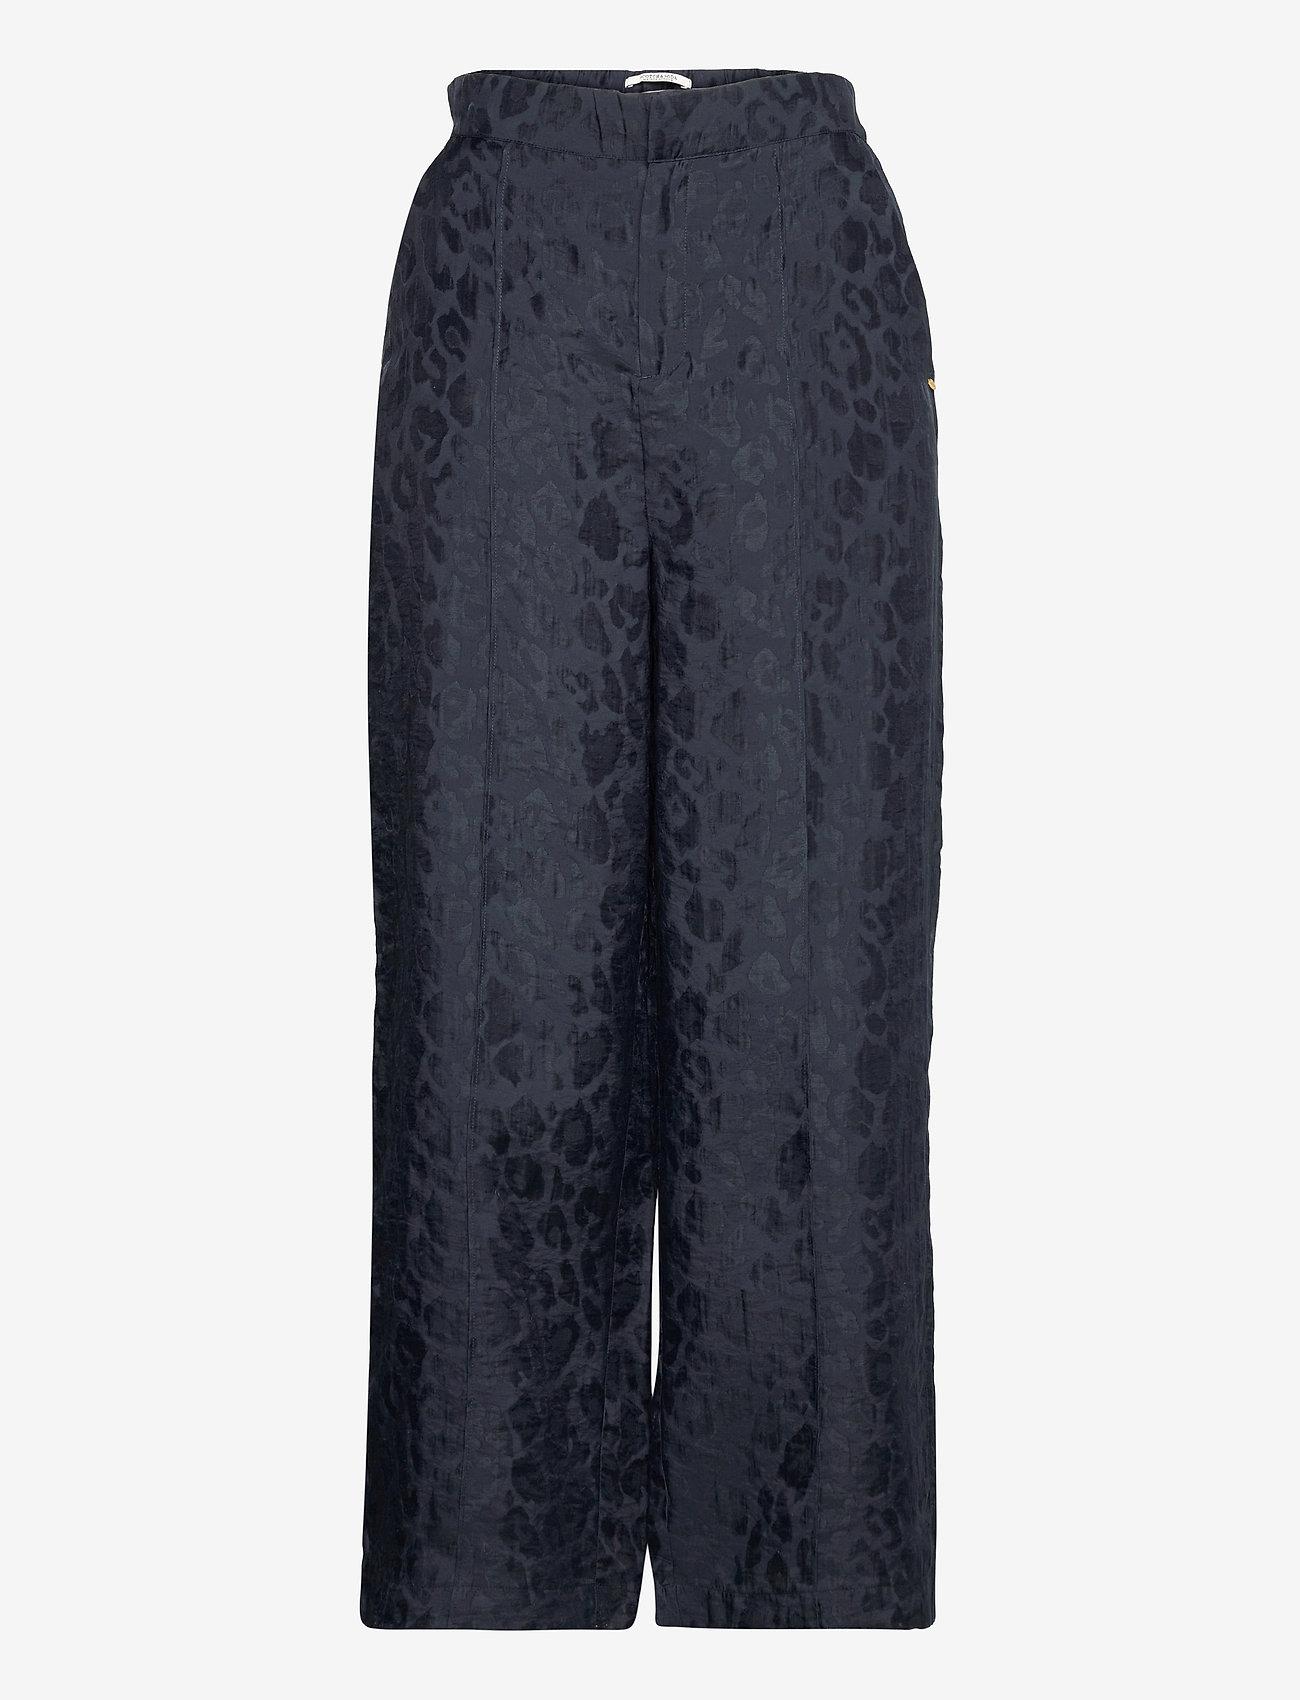 Scotch & Soda - Jogger pants in animal jacquard quality - bukser med brede ben - night - 0